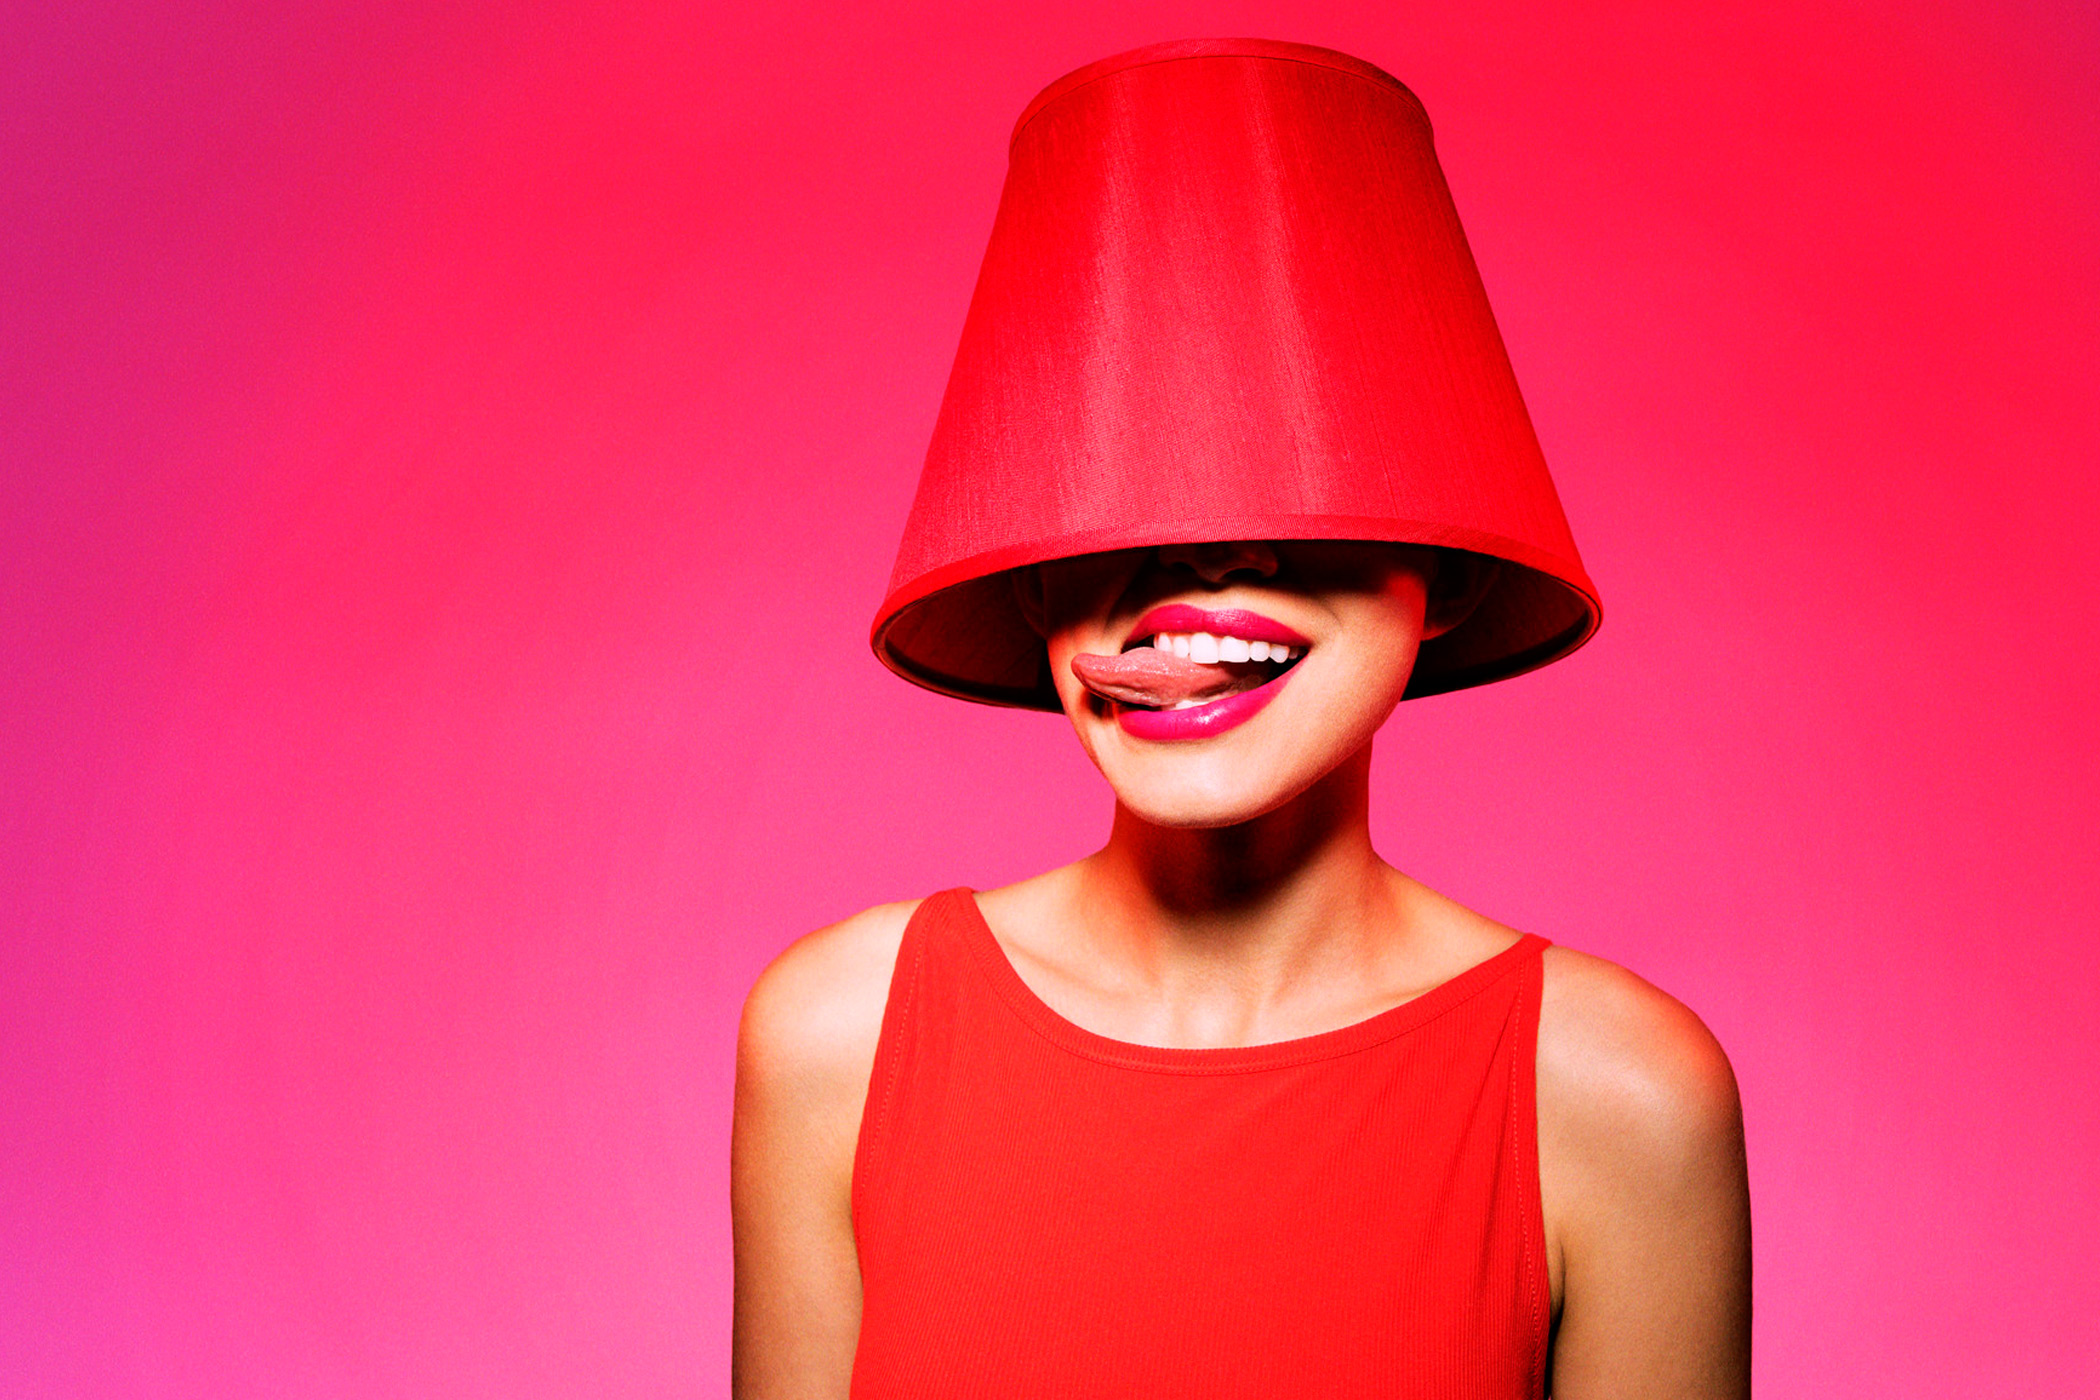 woman wearing red tank dress